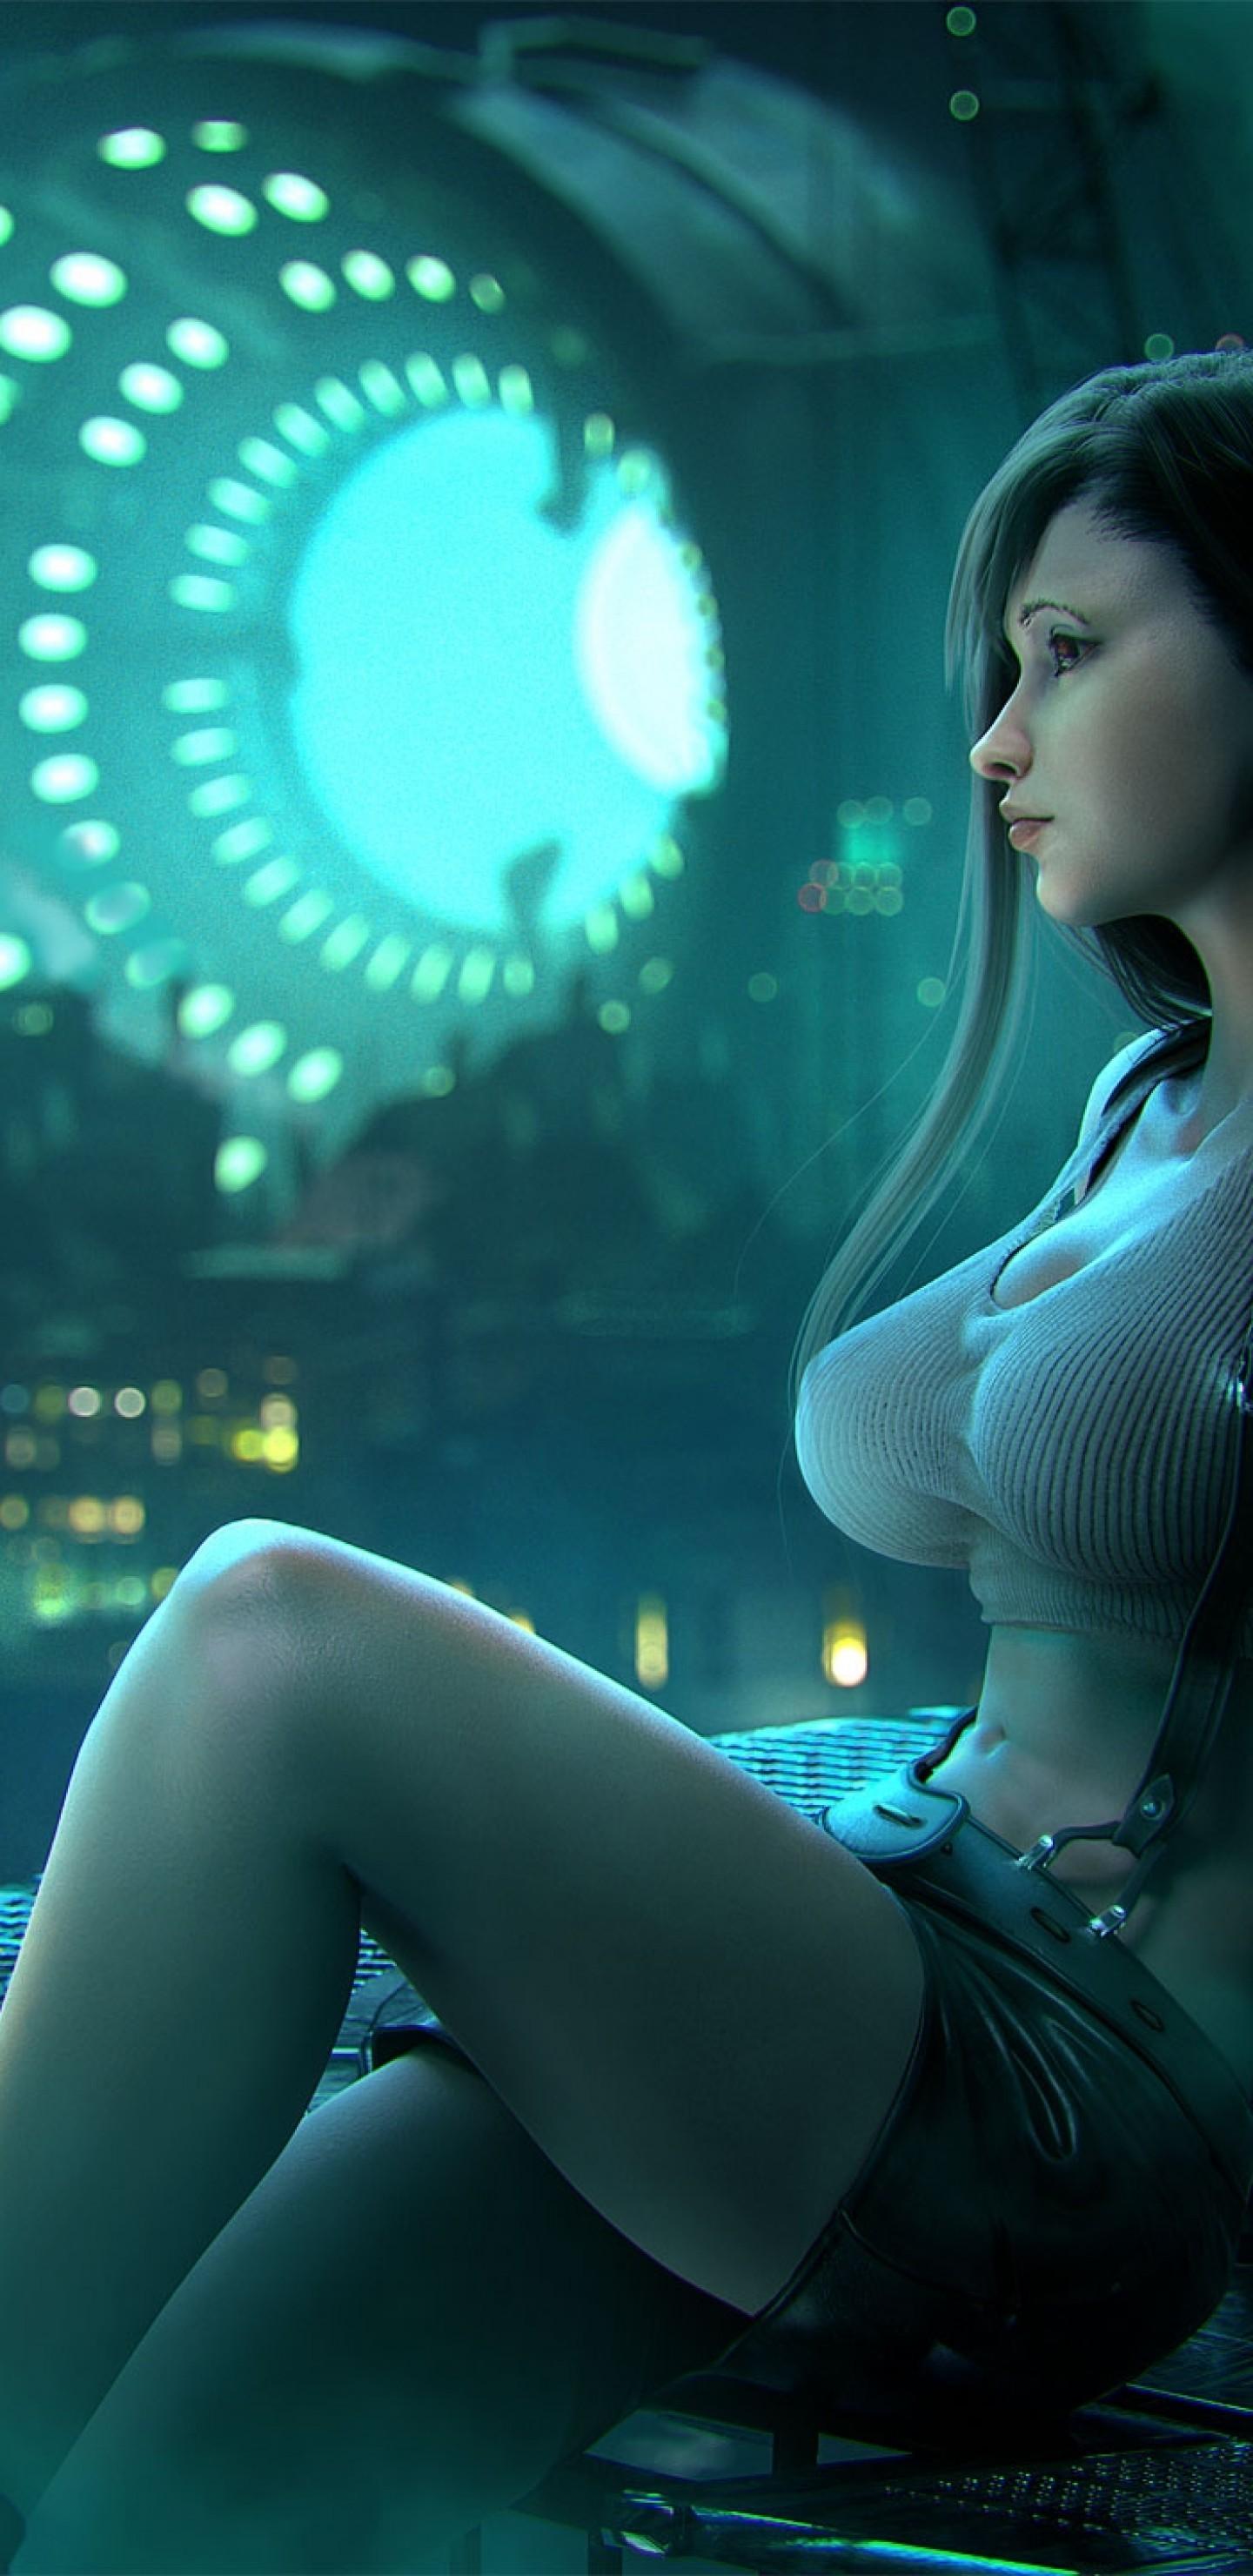 Res: 1440x2960, Final Fantasy Xiv, Tifa Lockhart, Sitting, Profile View